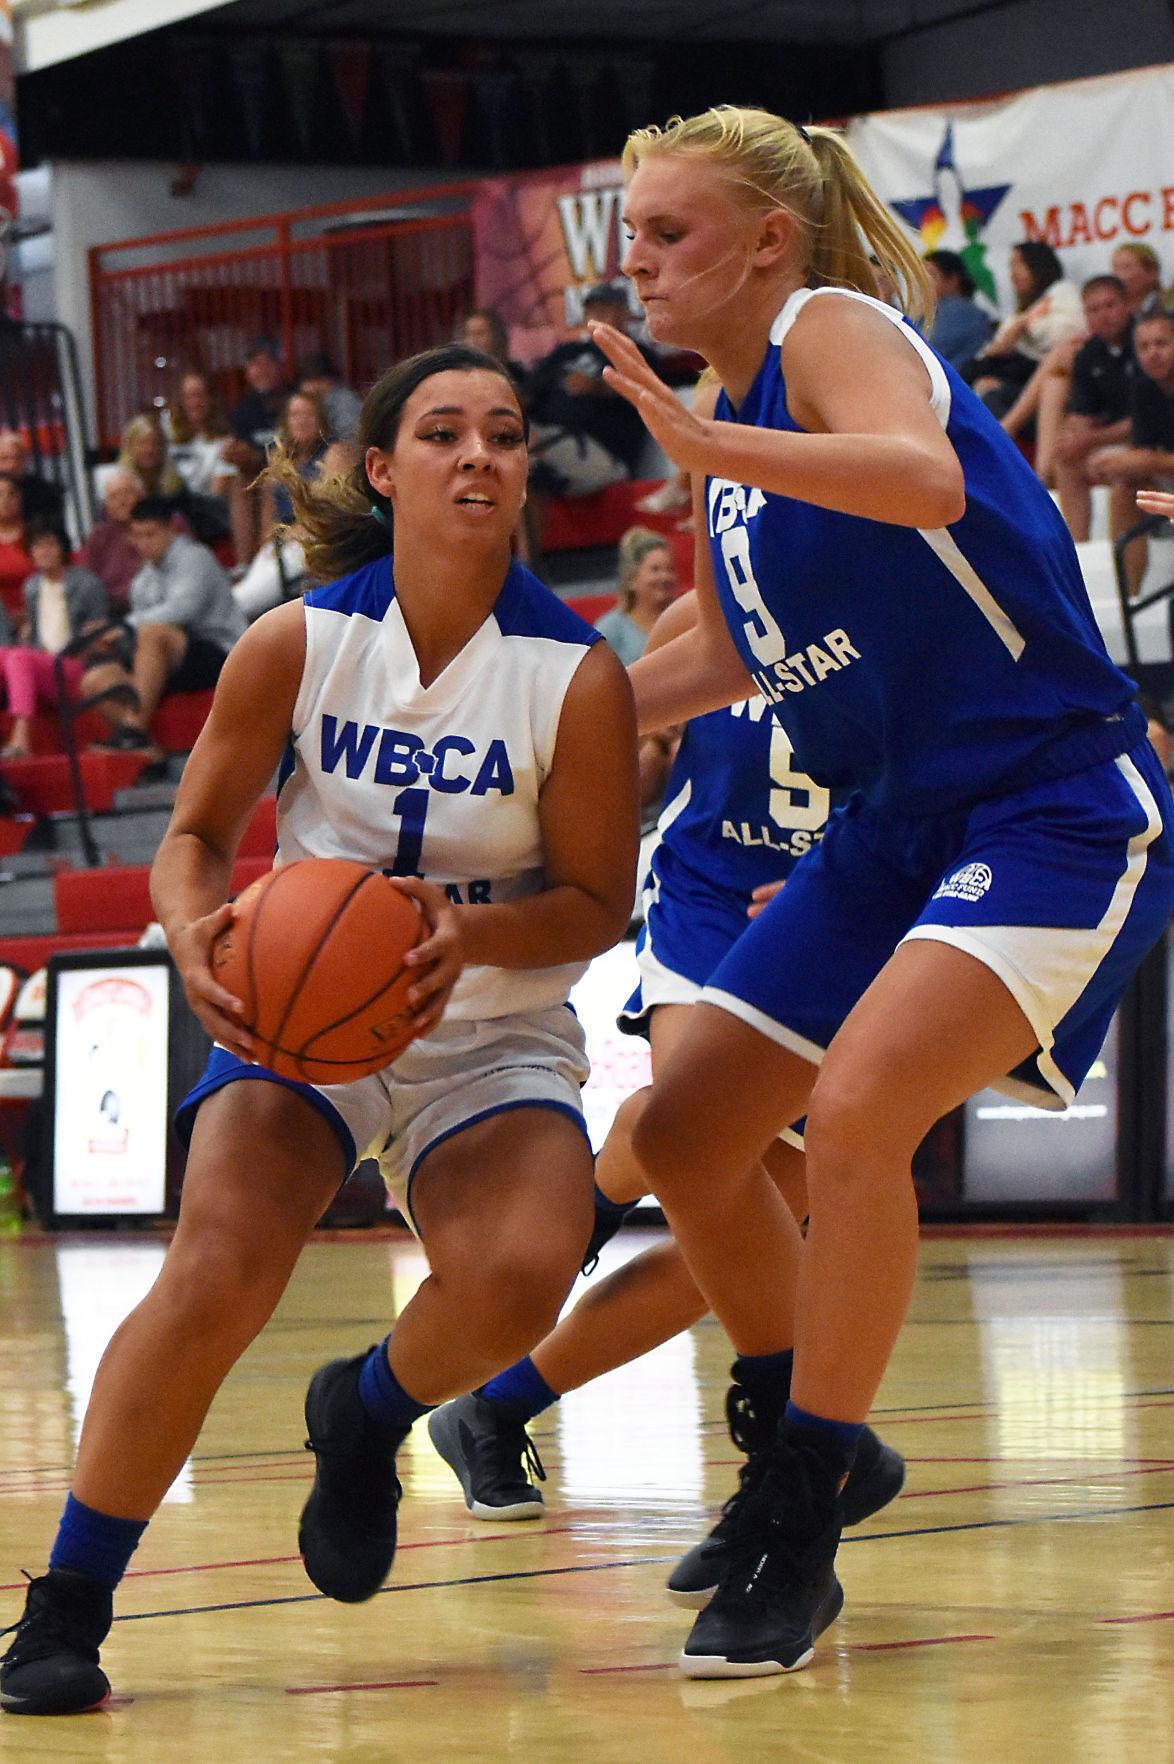 Prep girls basketball photo: Memorial's Mia Morel and Watertown's Teya Maas